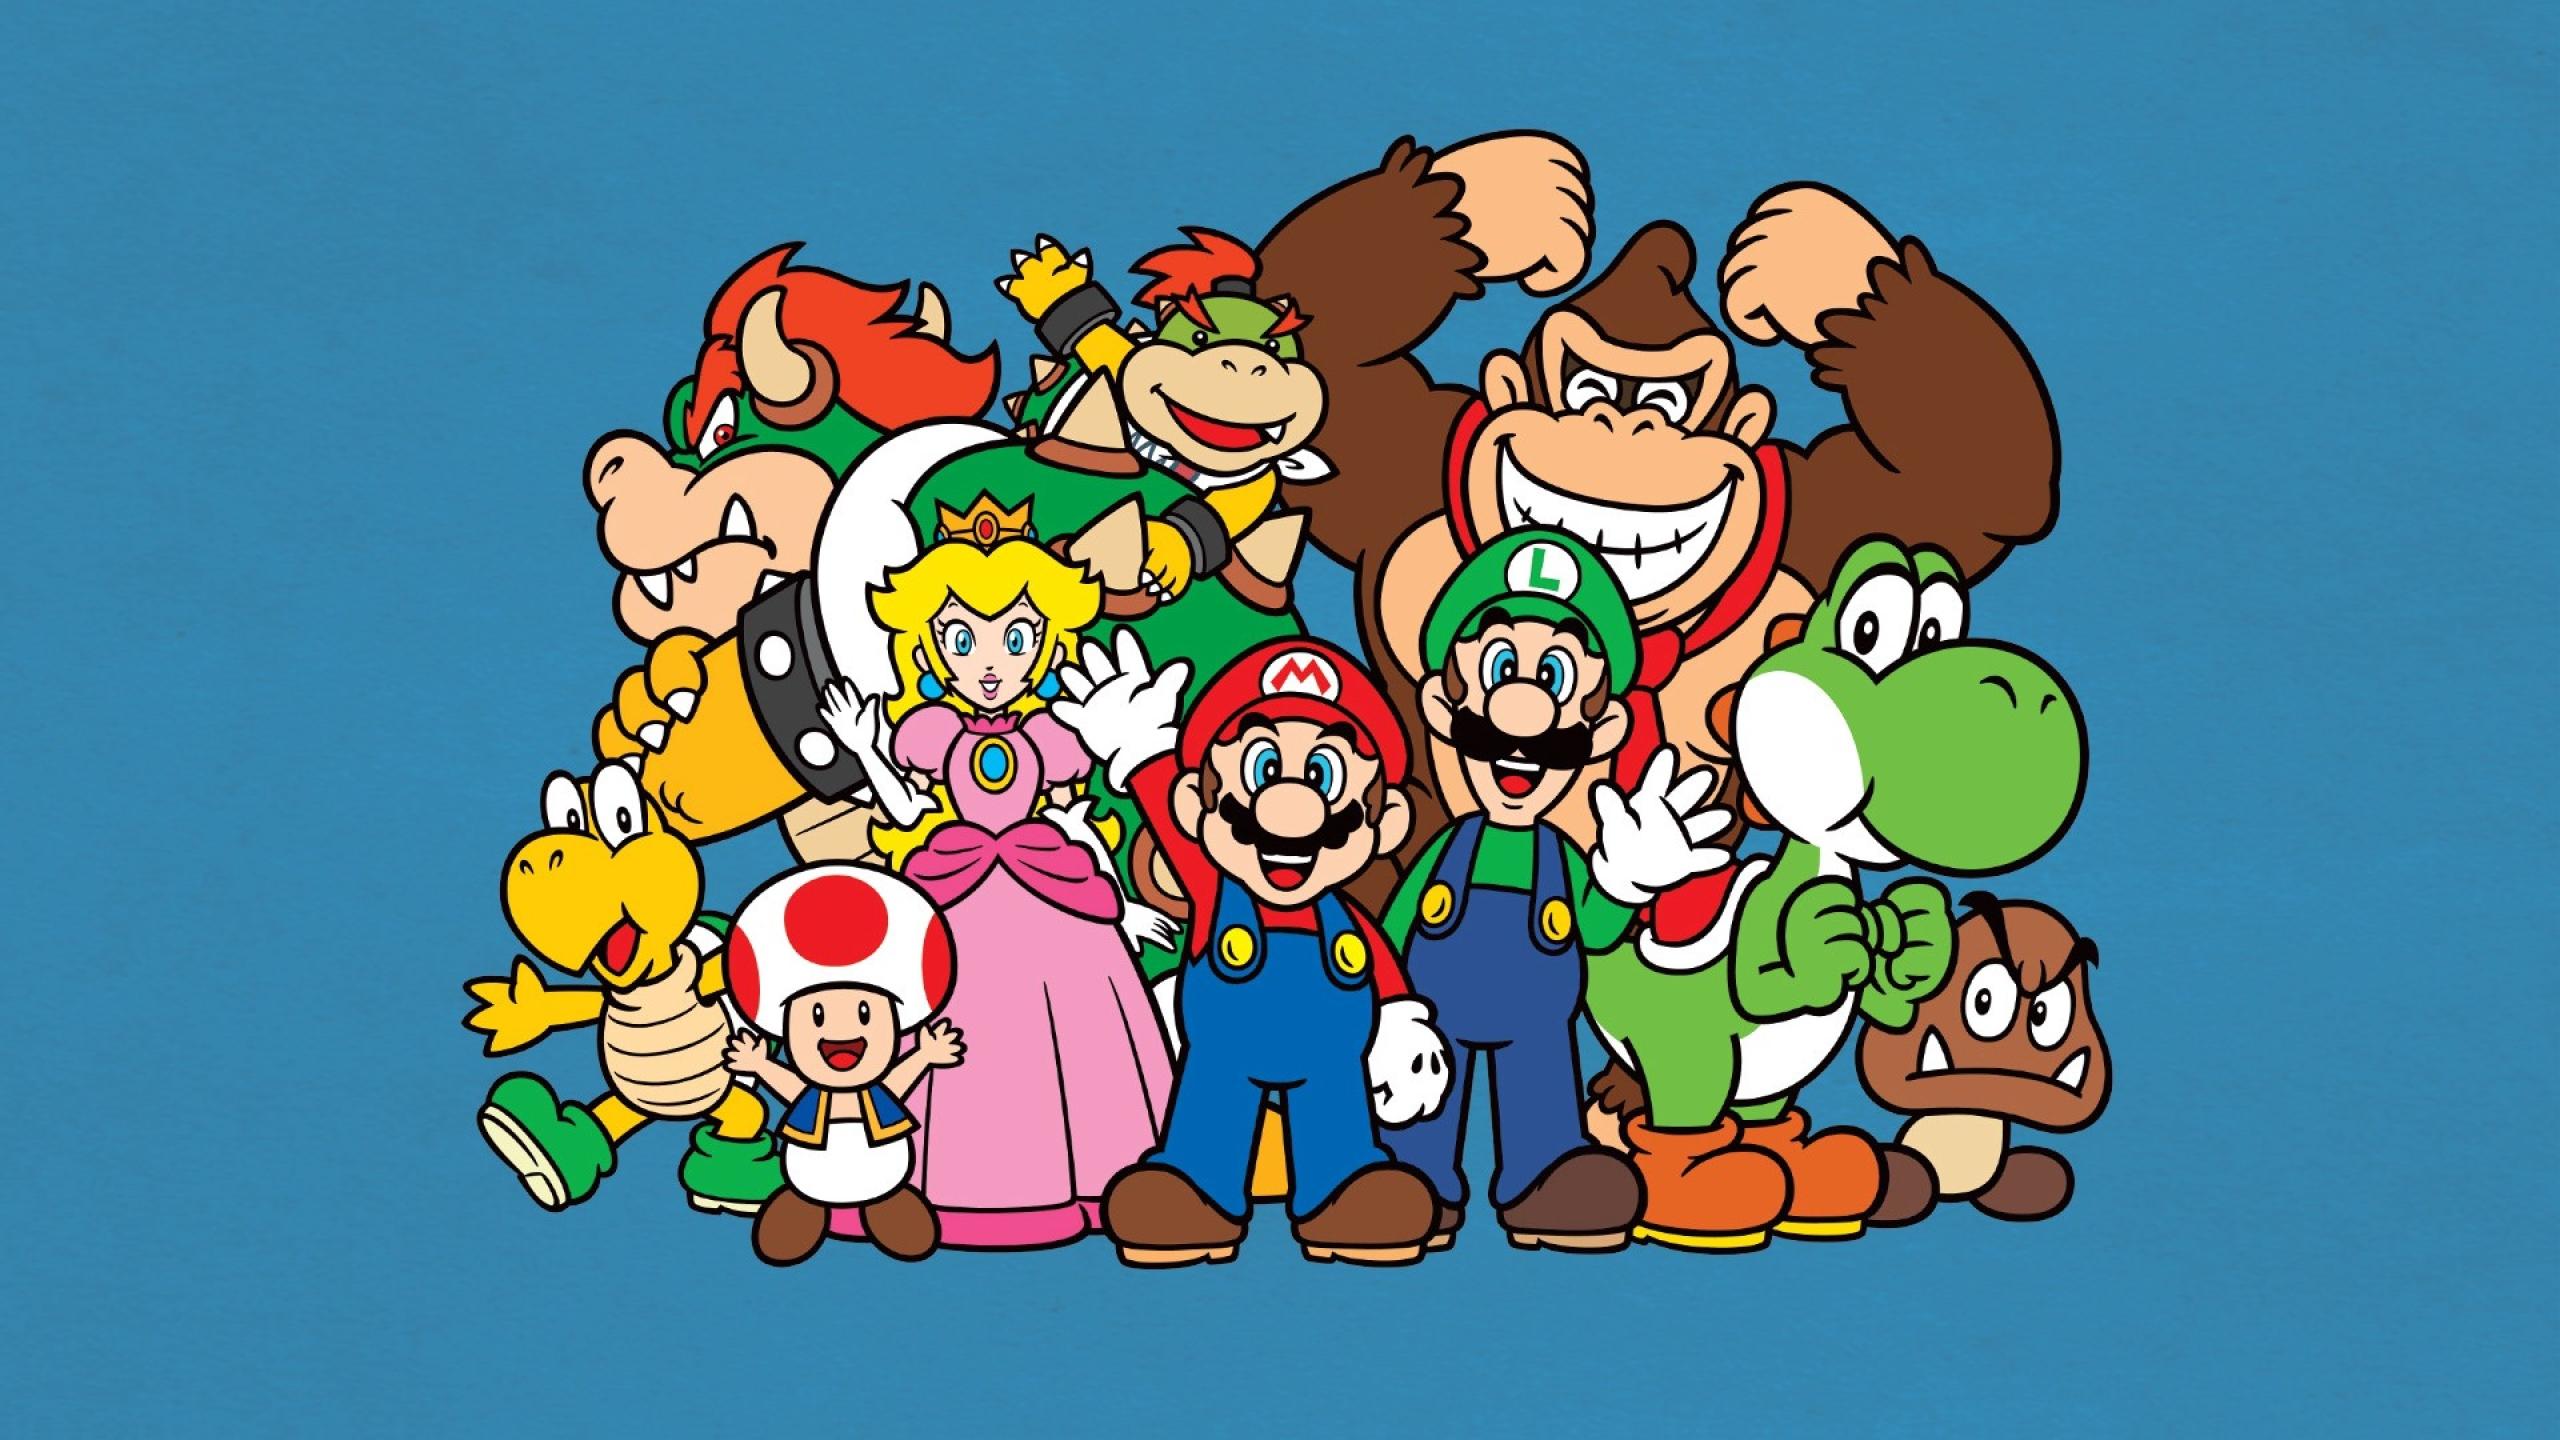 2560x1440 Mario Bros Luigi Yoshi 1440p Resolution Wallpaper Hd Games 4k Wallpapers Images Photos And Background